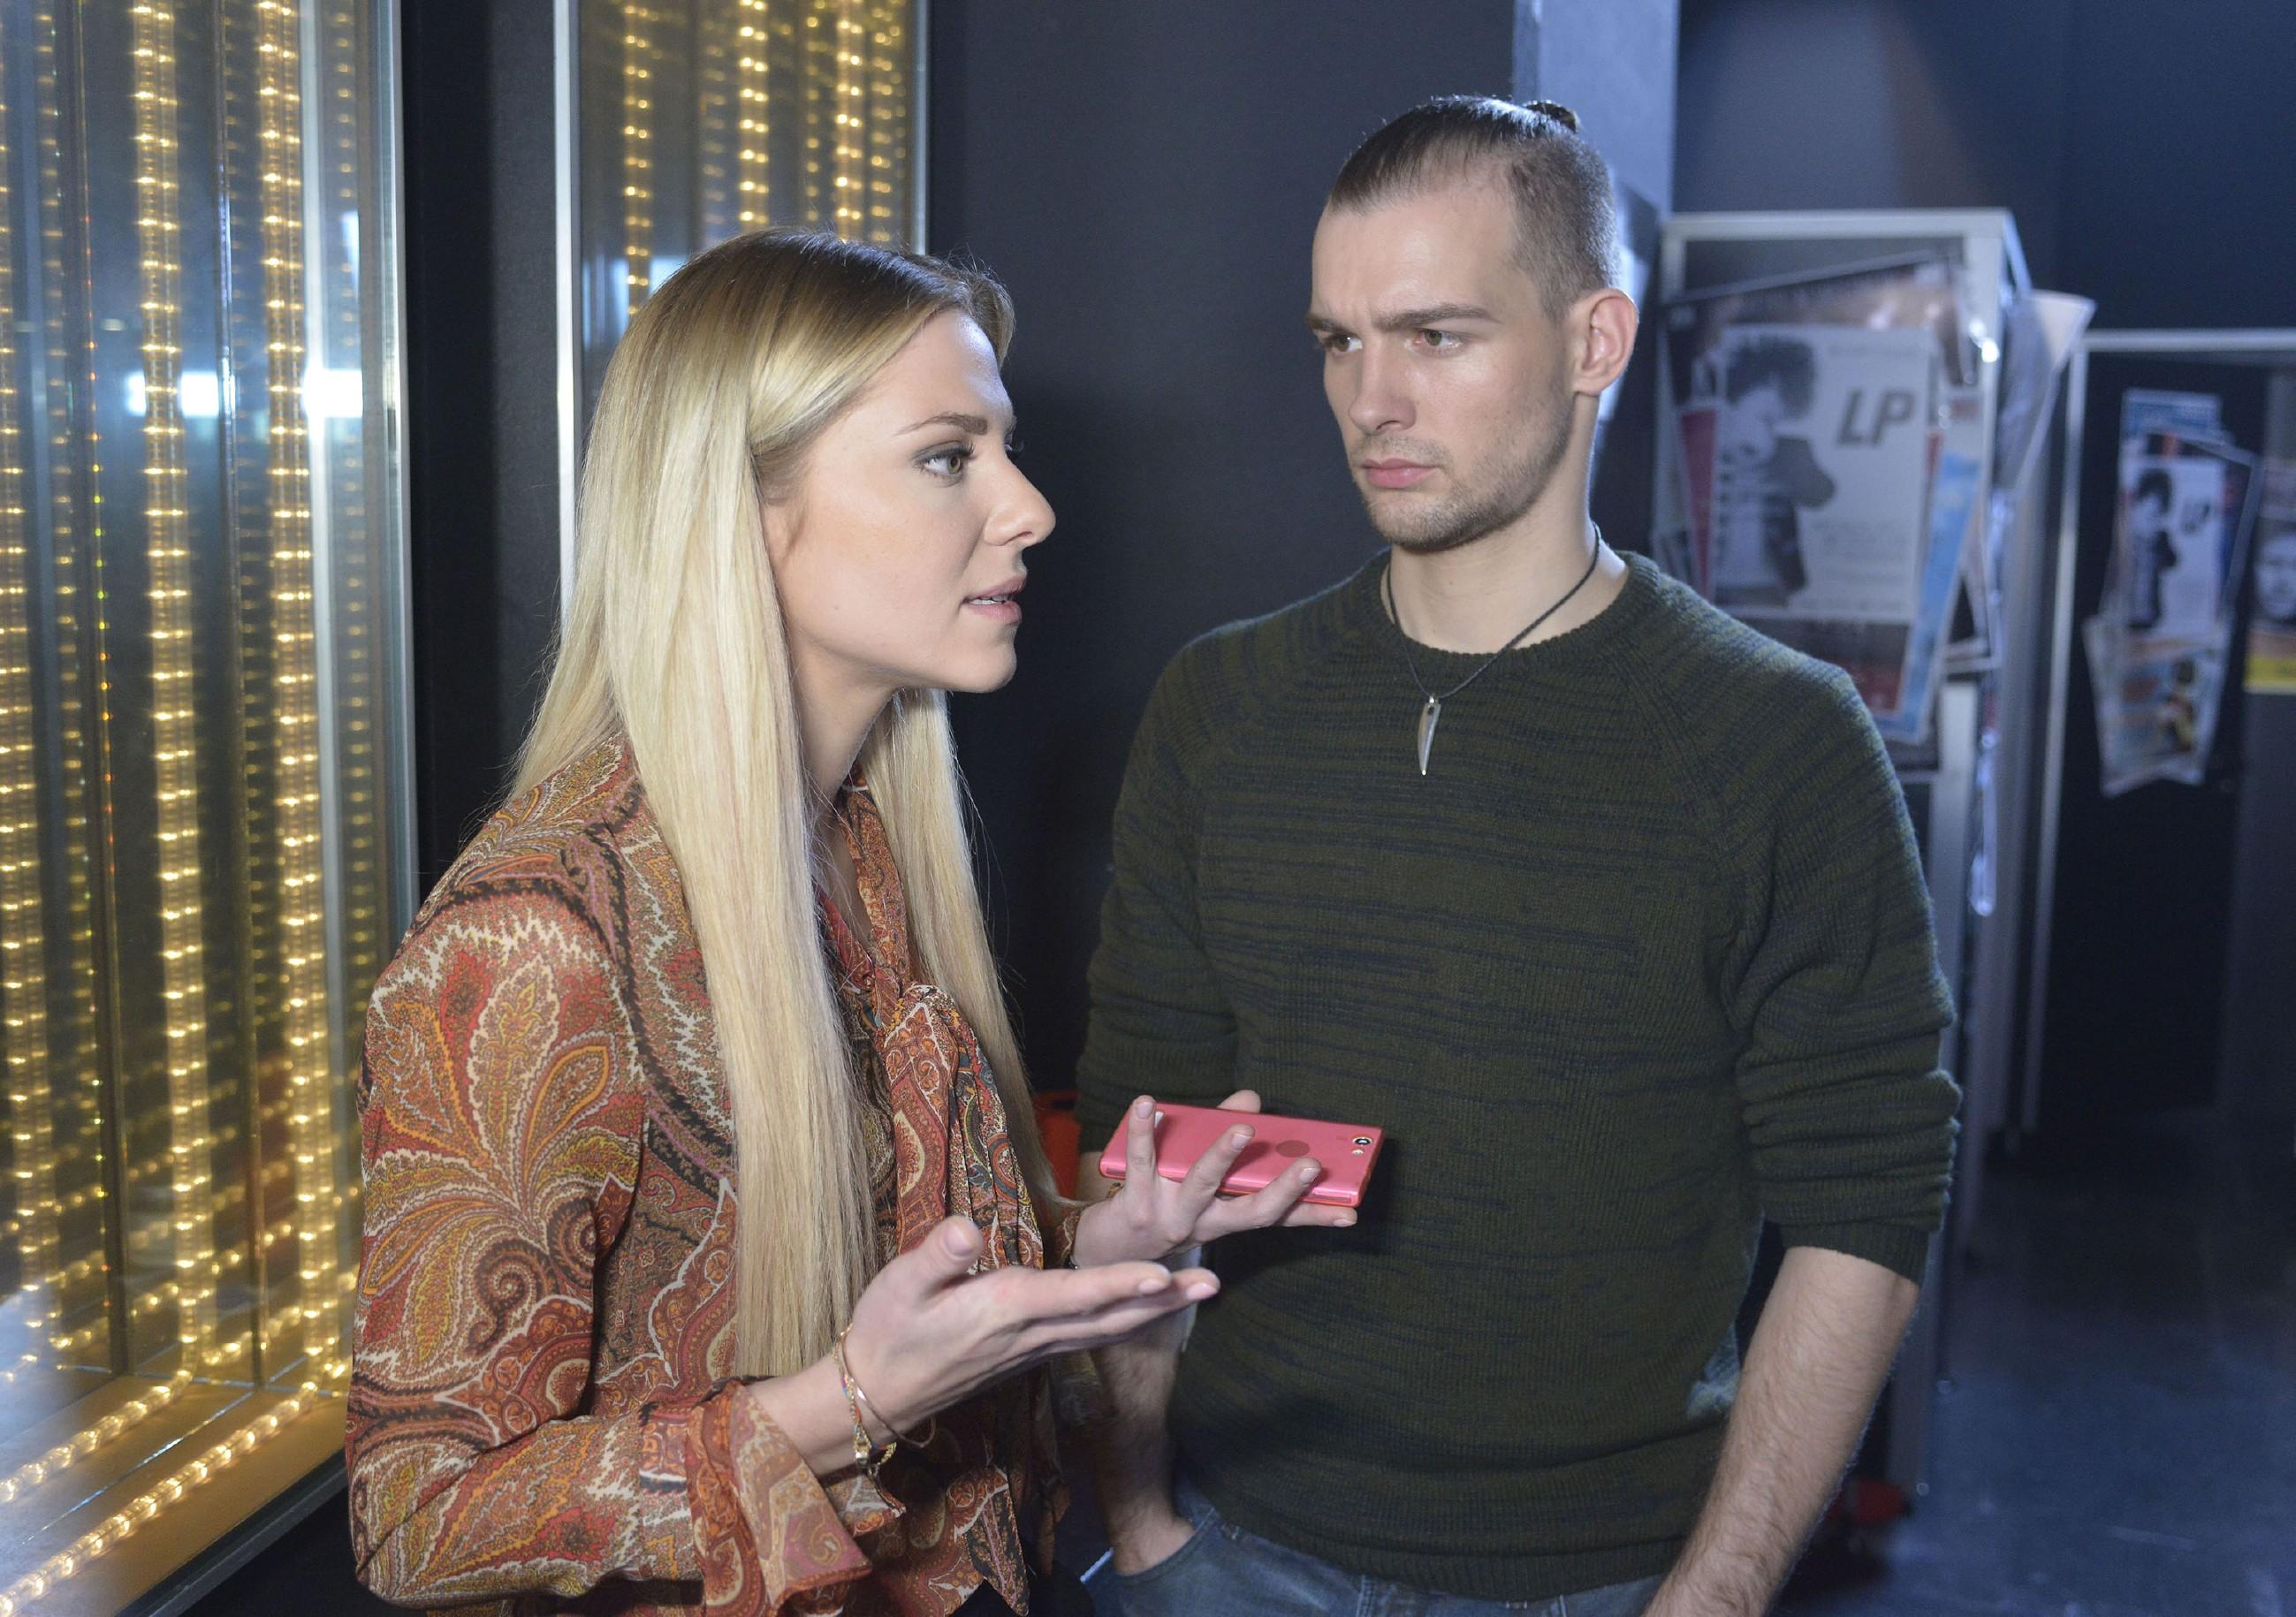 Chris (Eric Stehfest) erkennt, dass er sich bei Sunny (Valentina Pahde) offenbar noch weiter ins Abseits geschossen hat. (Quelle: RTL / Rolf Baumgartner)